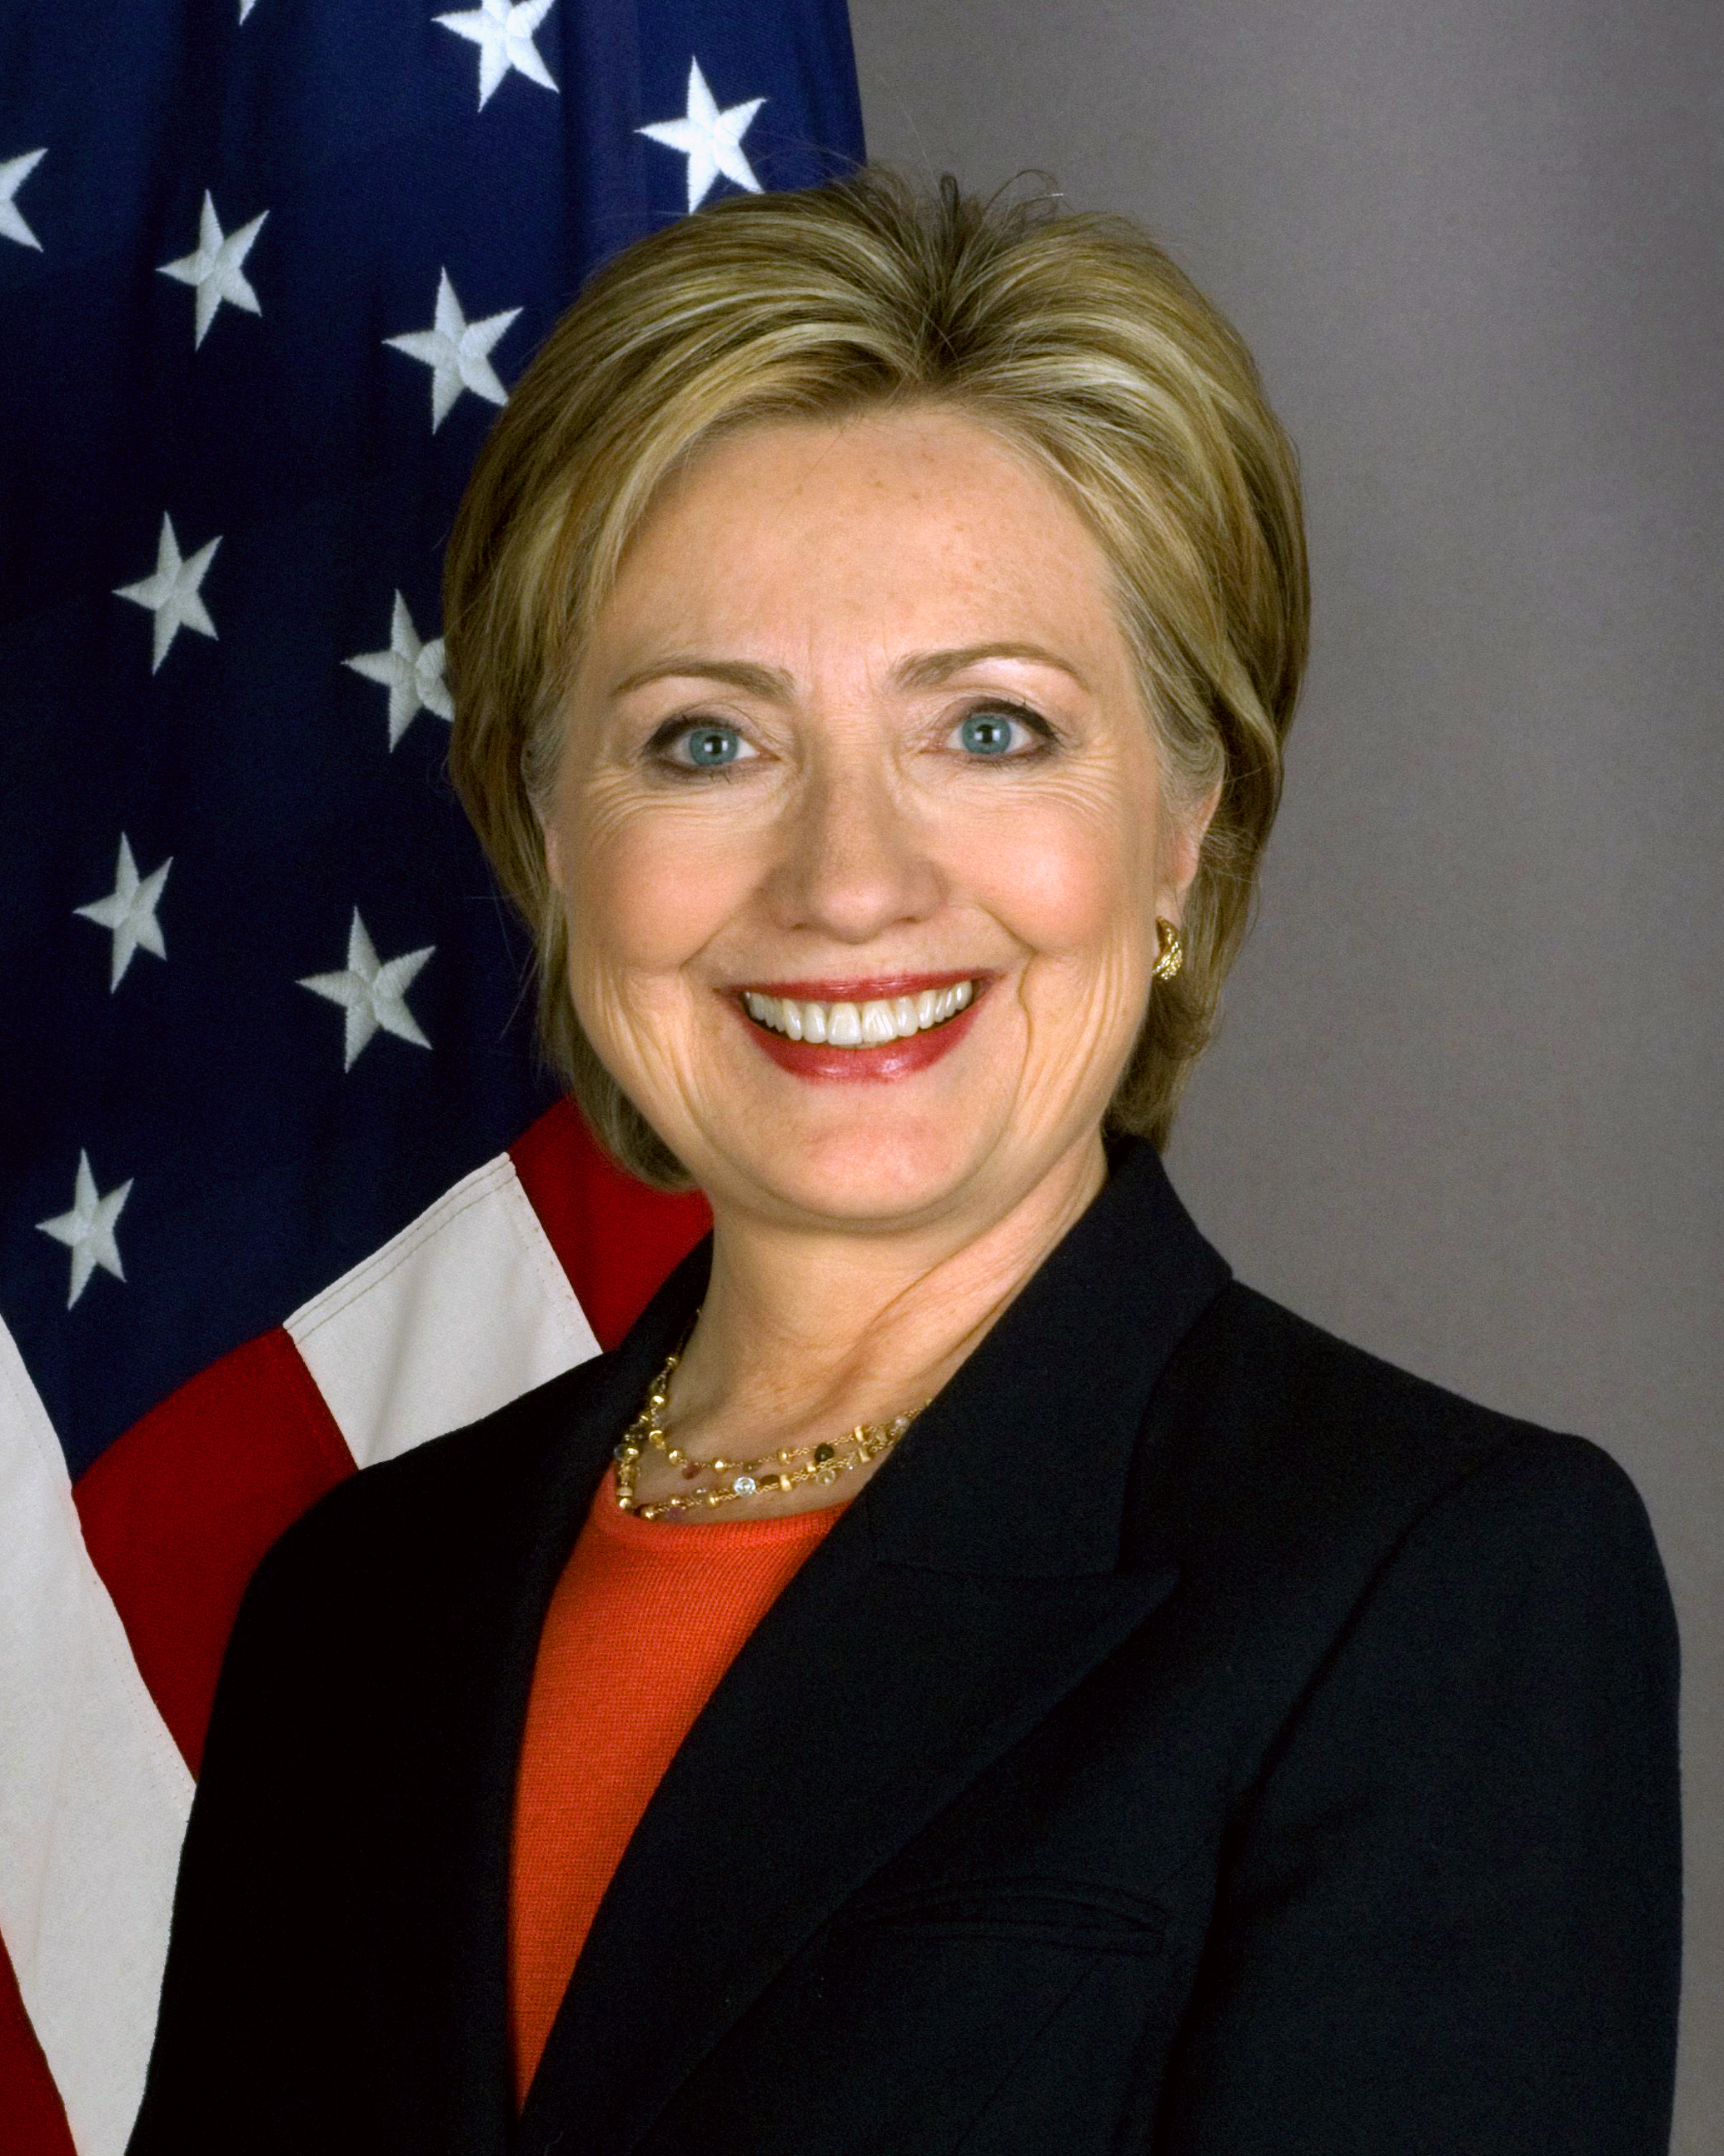 High Resolution Wallpaper | Hillary Rodham Clinton 2070x2588 px